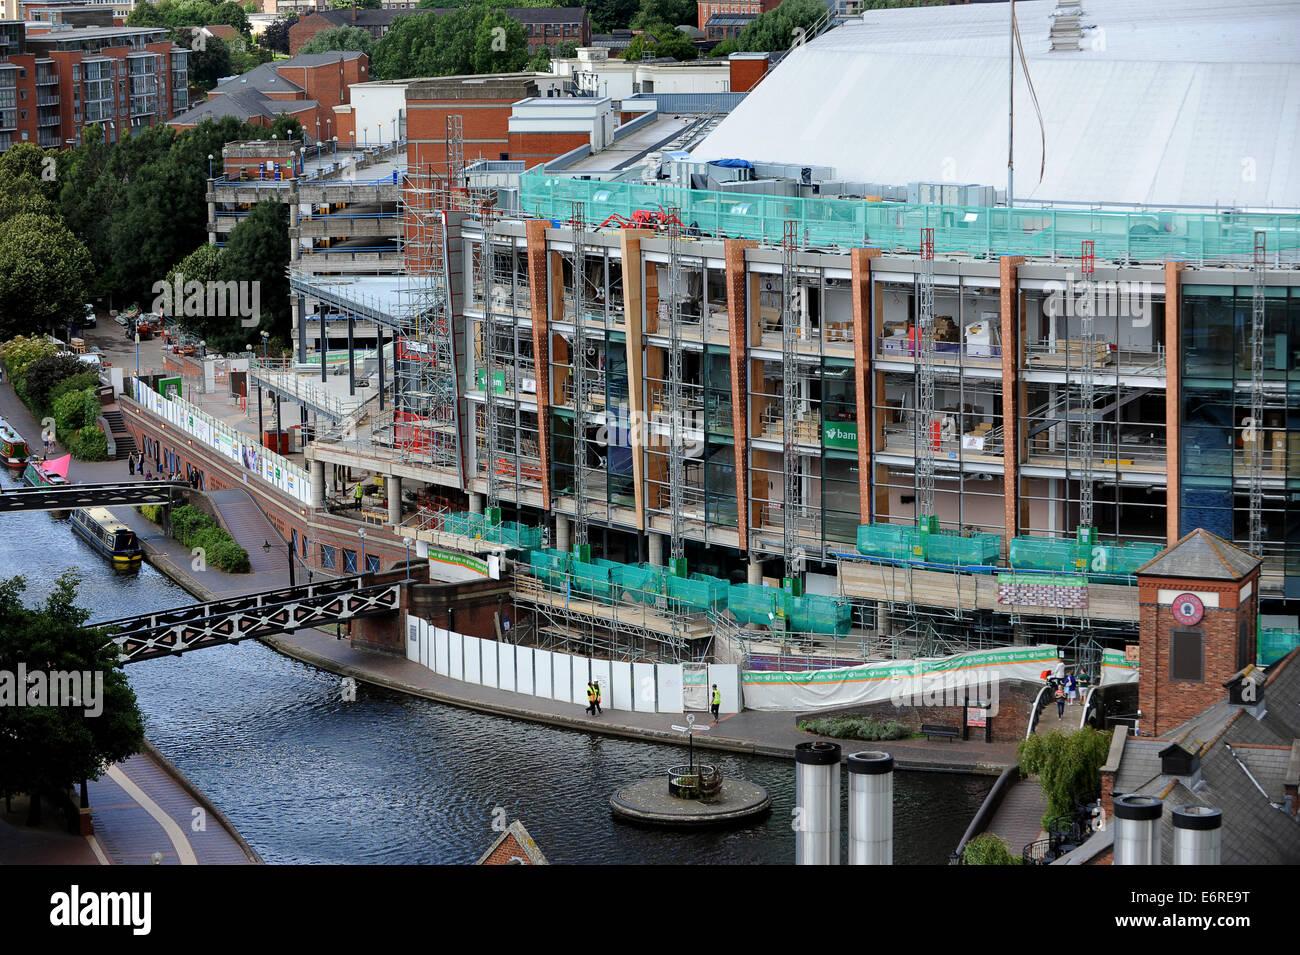 Modern construction work on the National Indoor Arena in Birmingham Uk - Stock Image